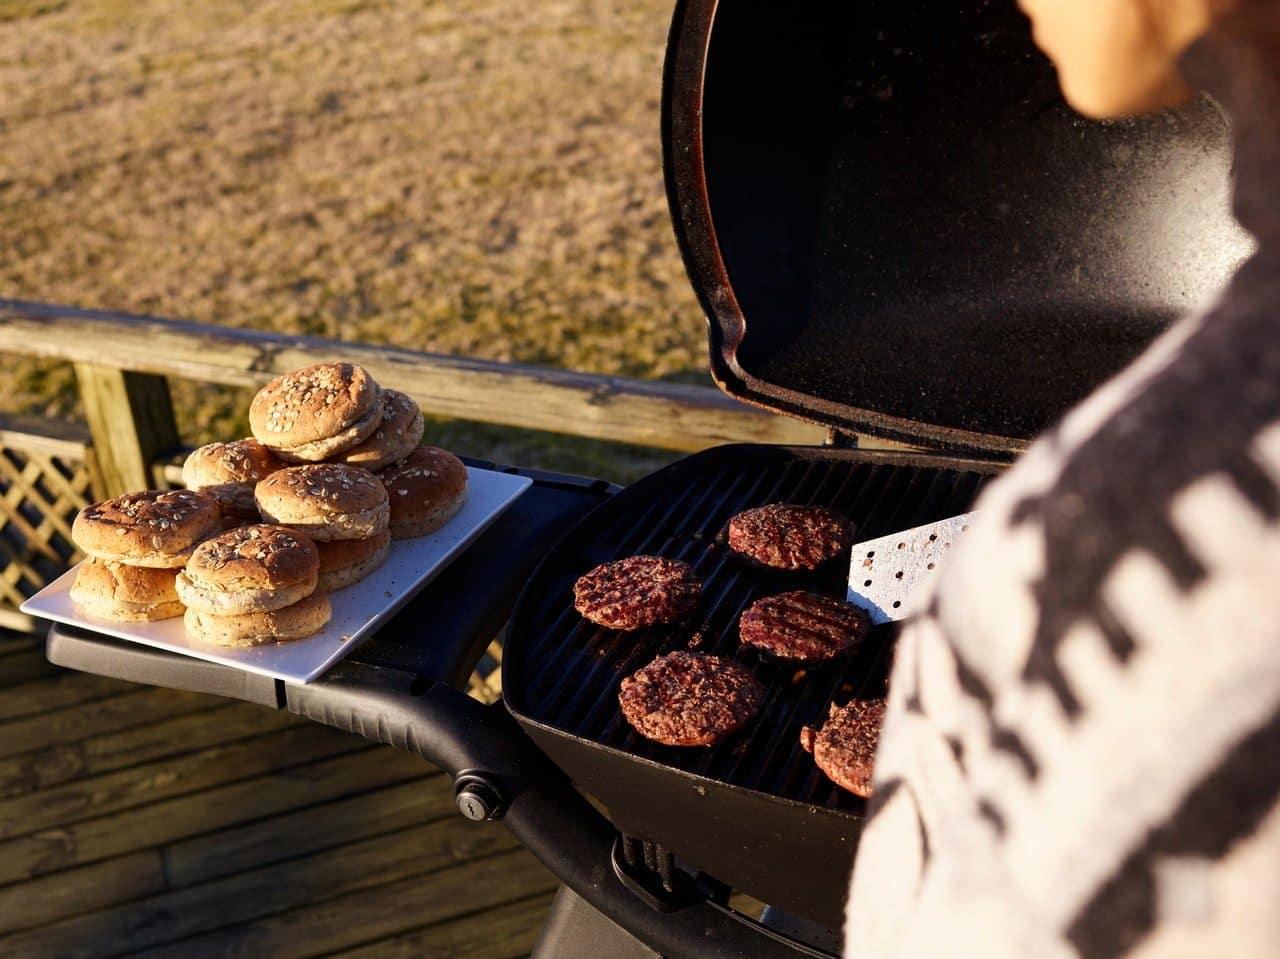 Grilovanie hamburgerov